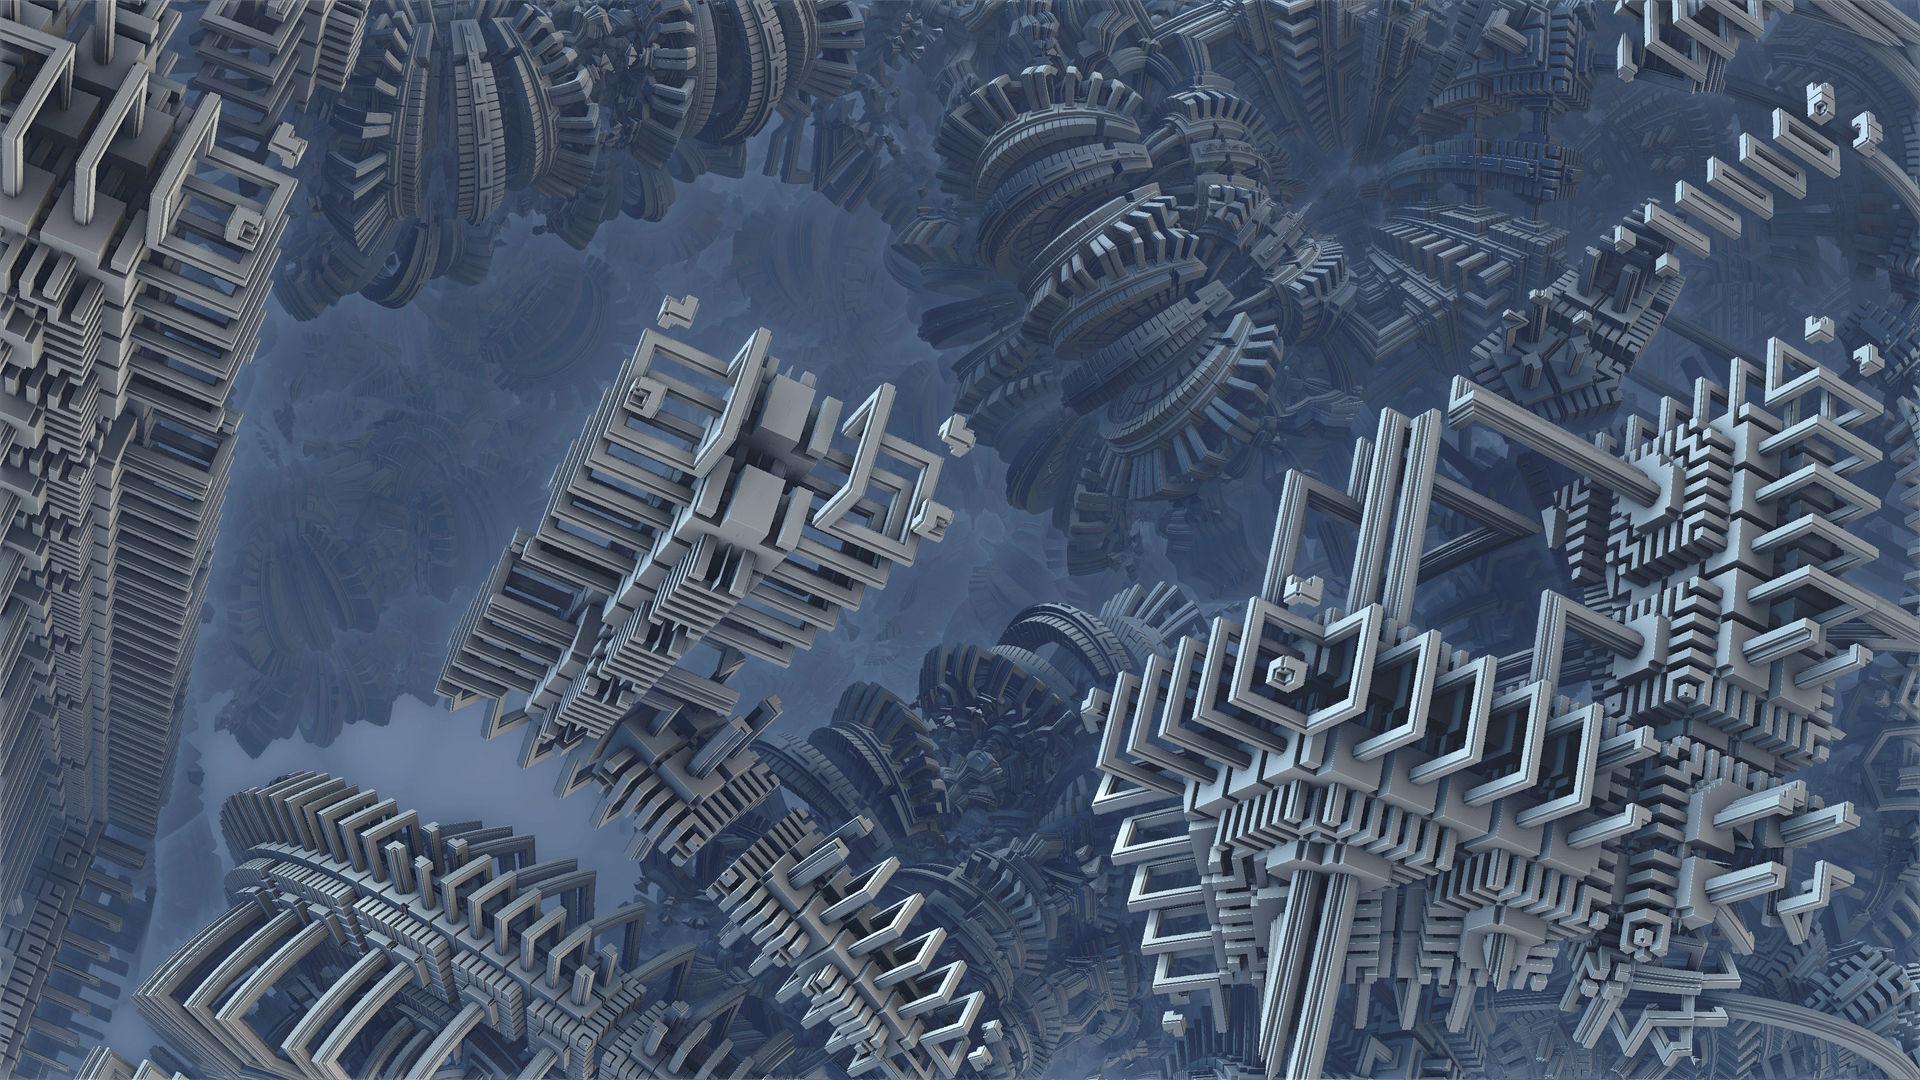 Matteo Zamagni: Nature Abstraction 2.0 and Seven Orbits